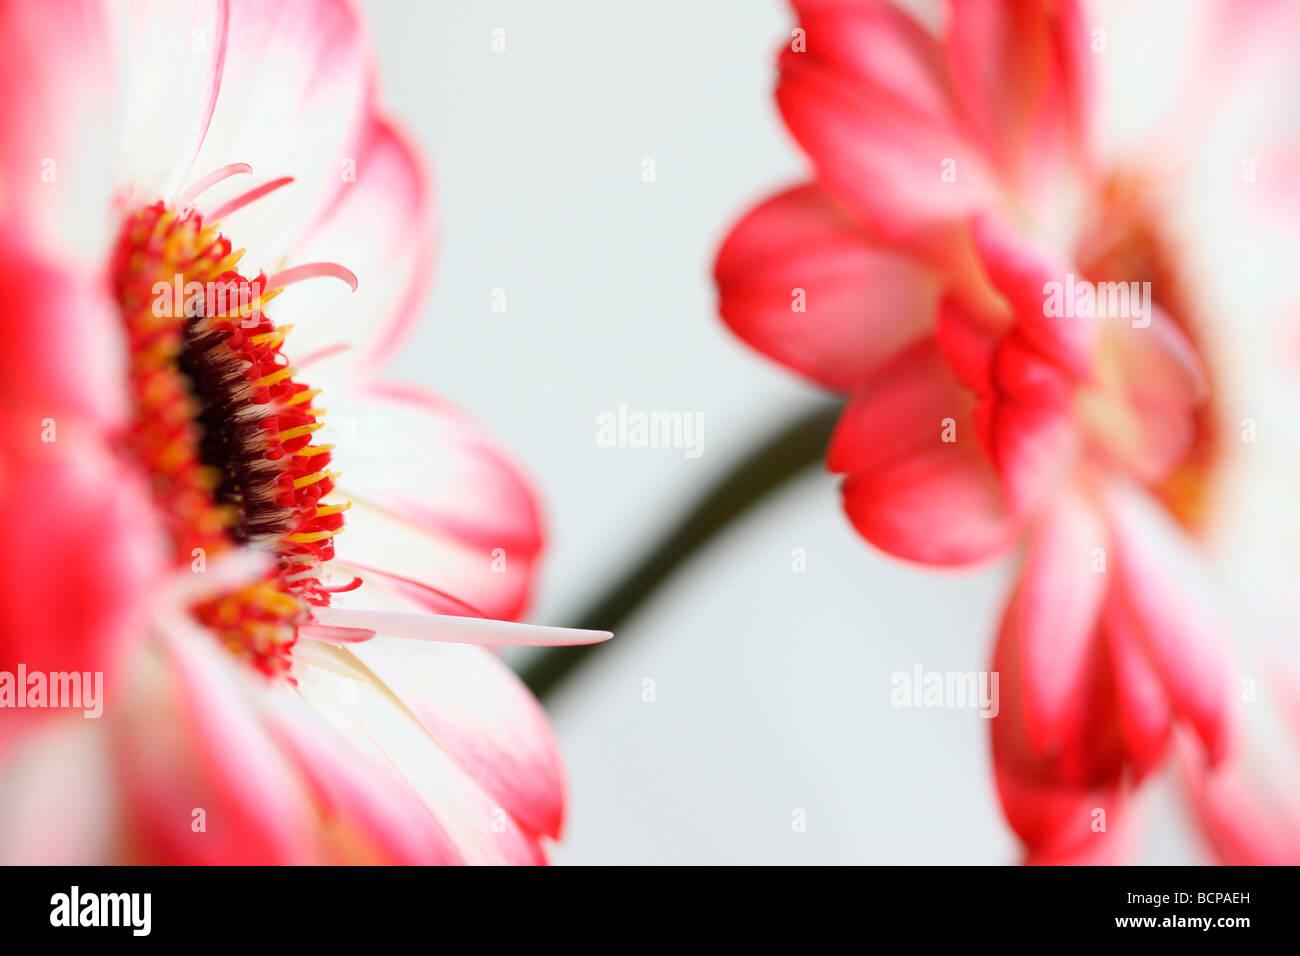 Fresca e pura immagine contemporanea di una punta rossa gerbere arte fotografia Jane Ann Butler JABP Fotografia367 Immagini Stock